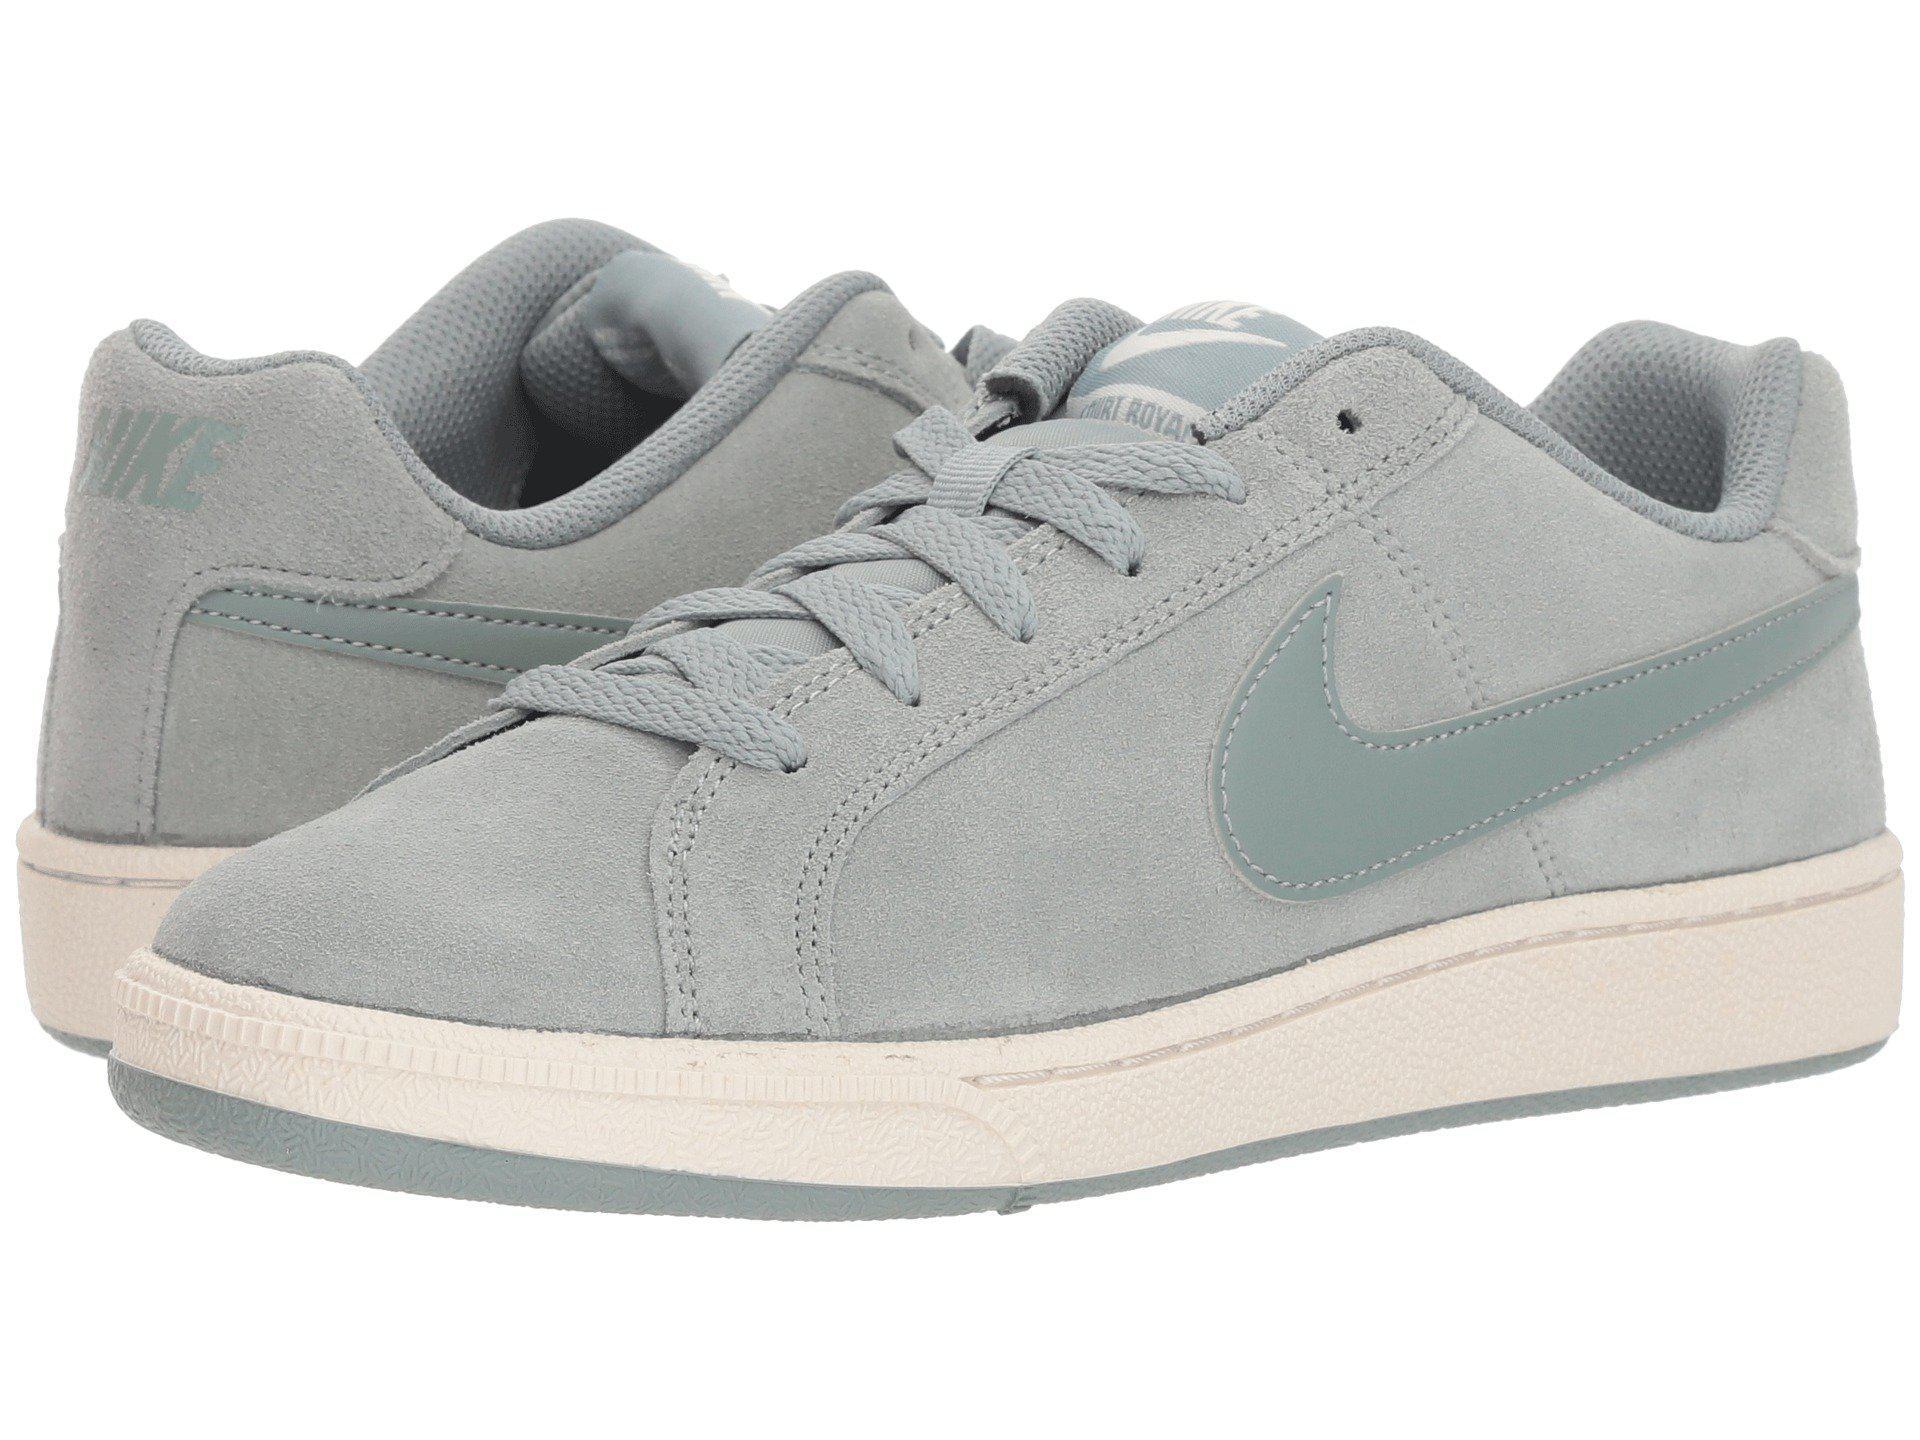 online retailer ae693 84ee2 nike-Mica-GreenMica-GreenPhantom-Court-Royale-Suede-blackblackthunder-Grey -Womens-Shoes.jpeg